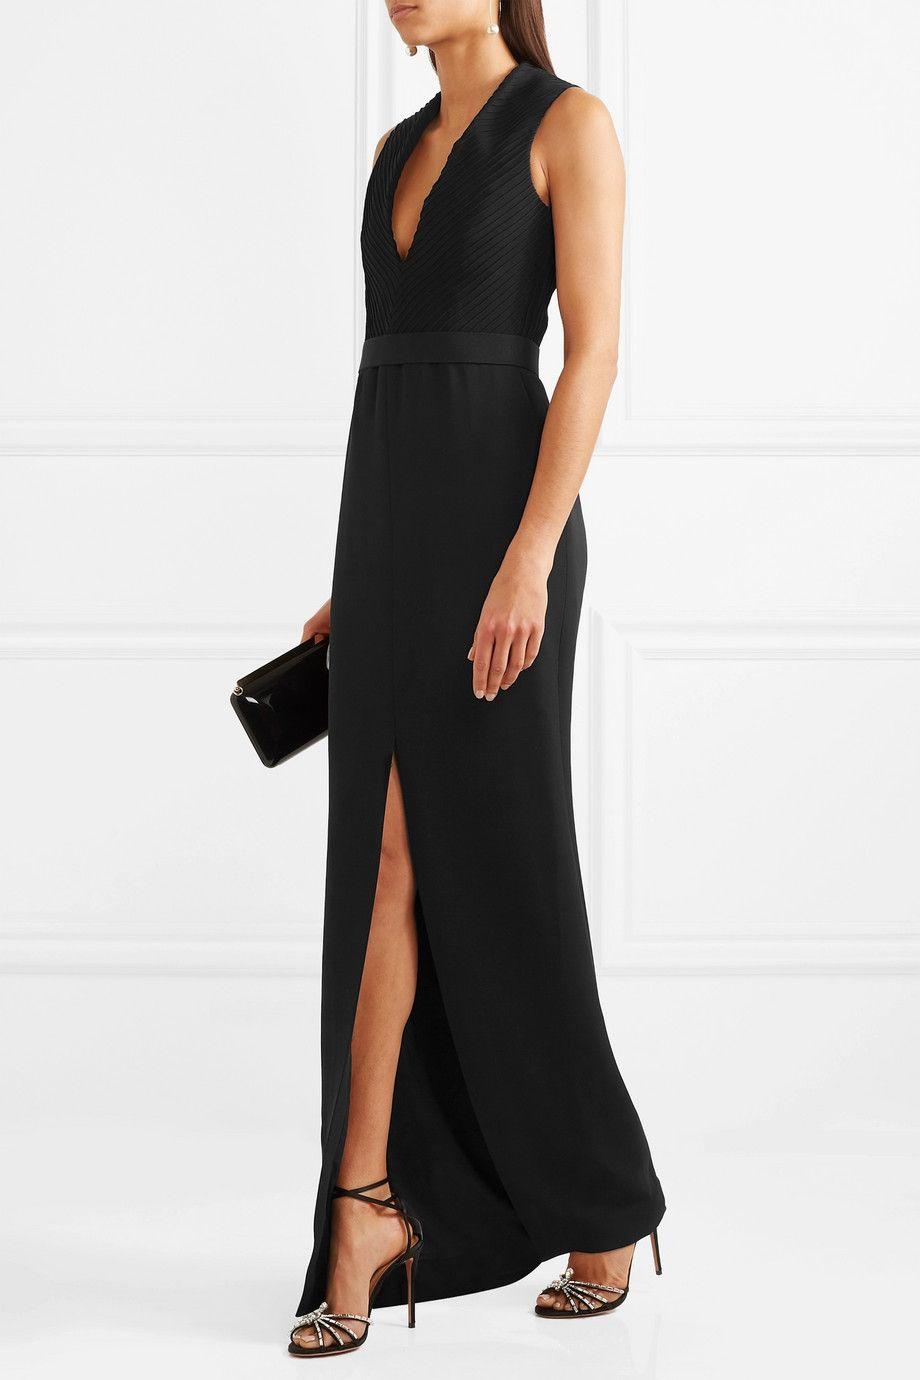 Pintucked Crepe Gown - Black Brandon Maxwell clv5ja